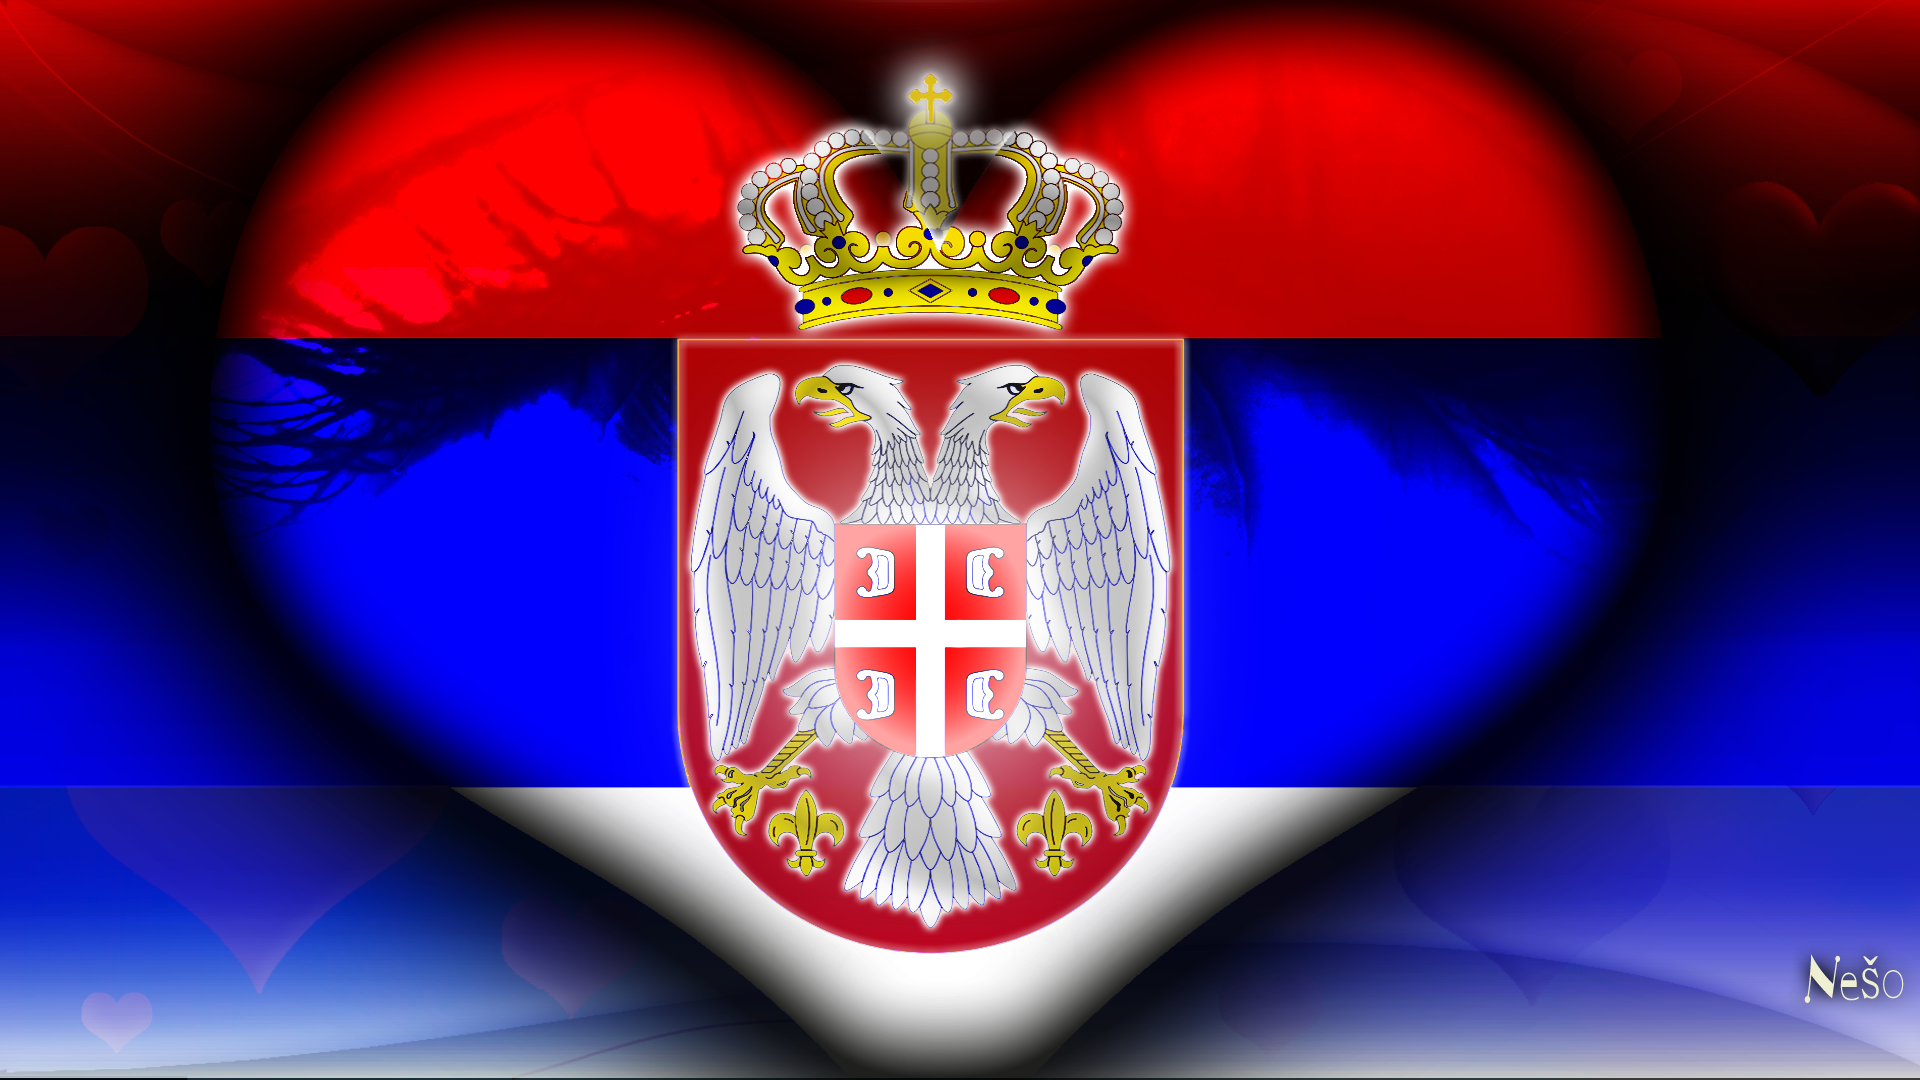 We love Serbia image   Slavic   Mod DB 1920x1080